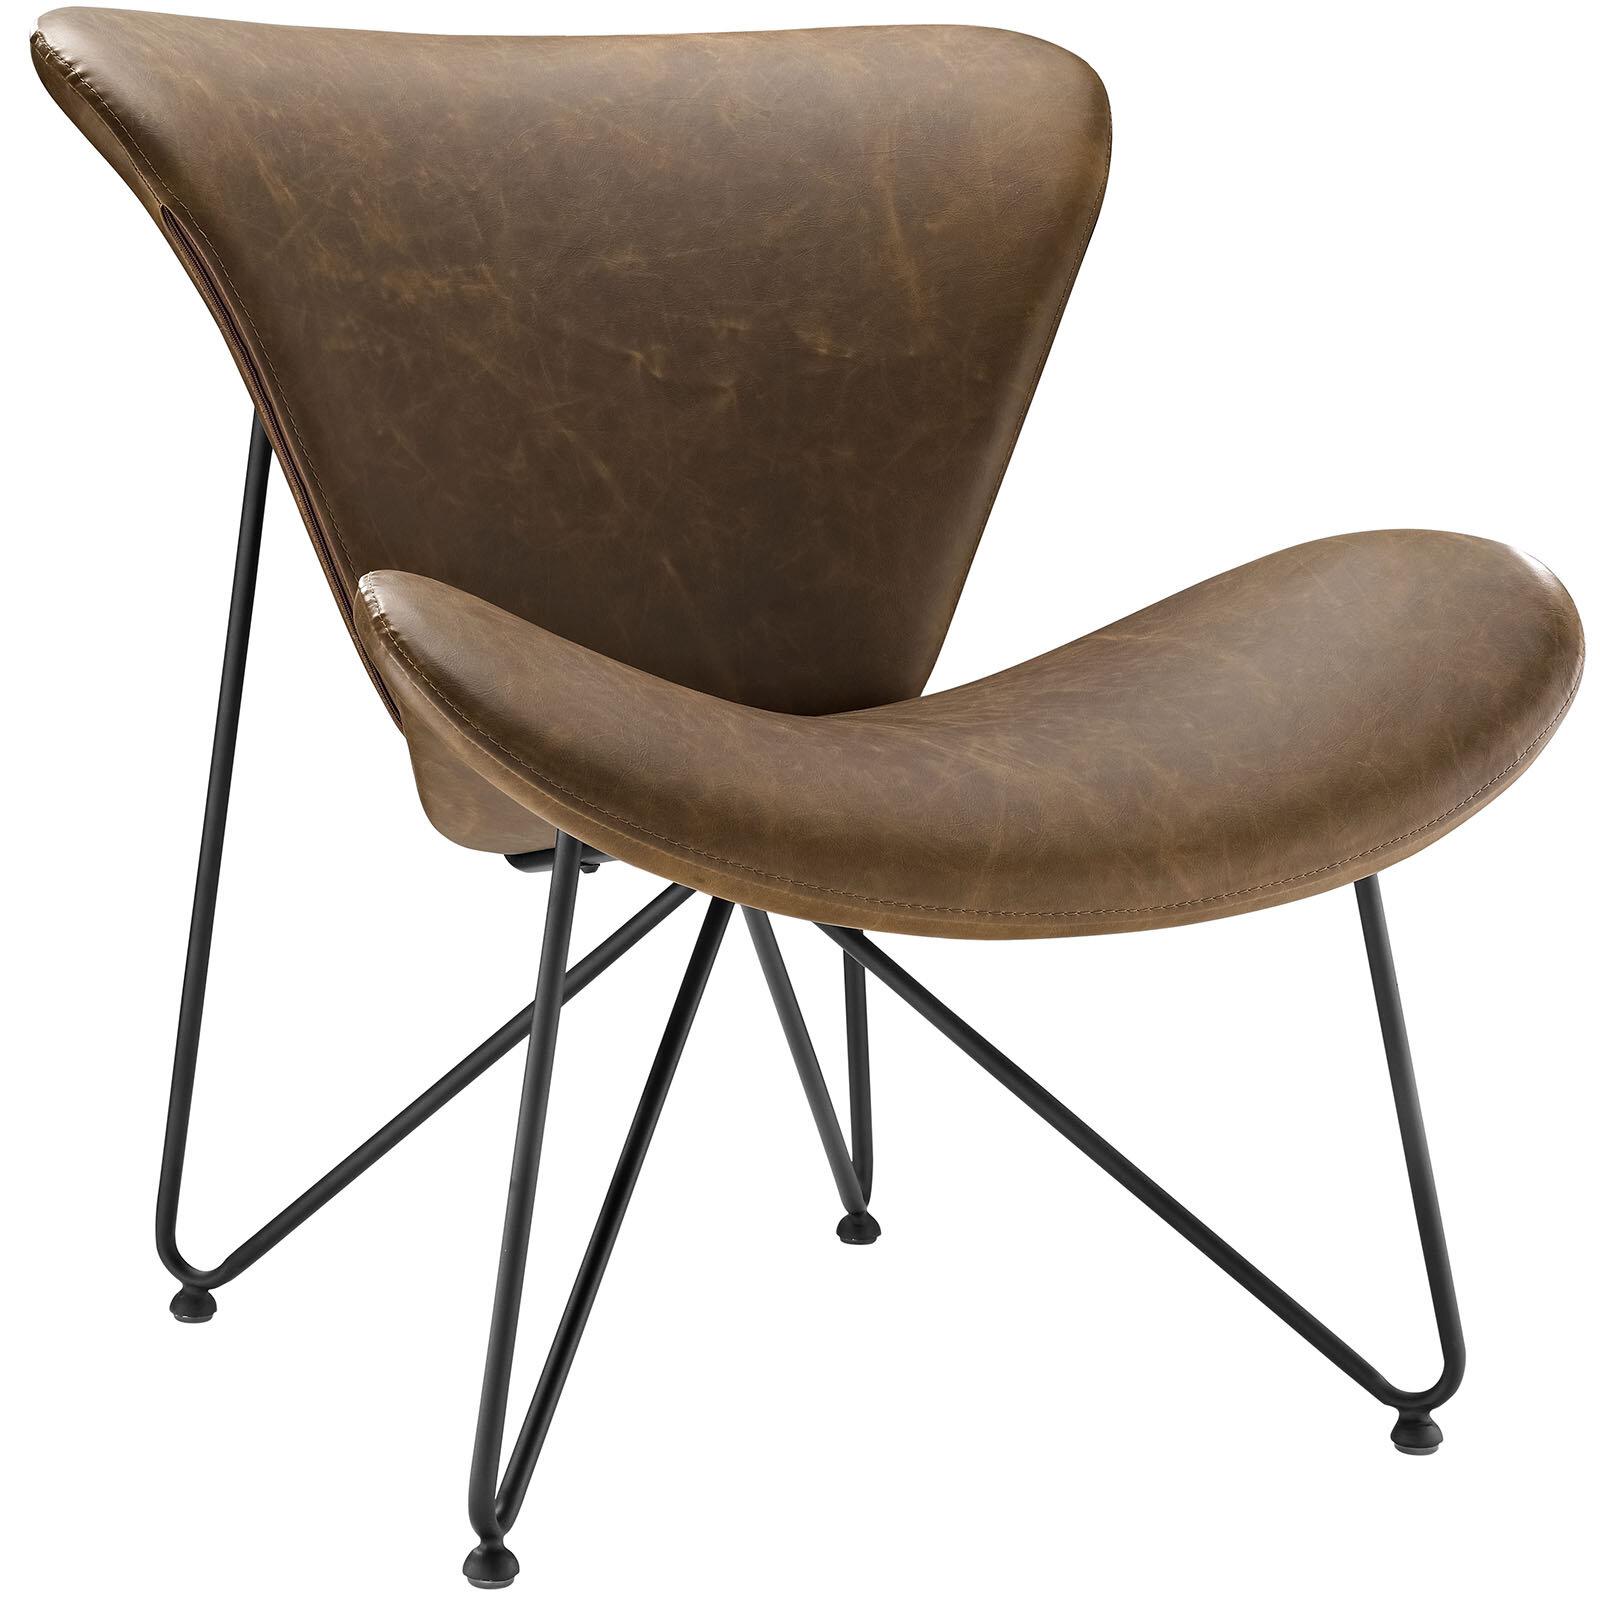 Charmant Modway Glide Lounge Chair U0026 Reviews   Wayfair